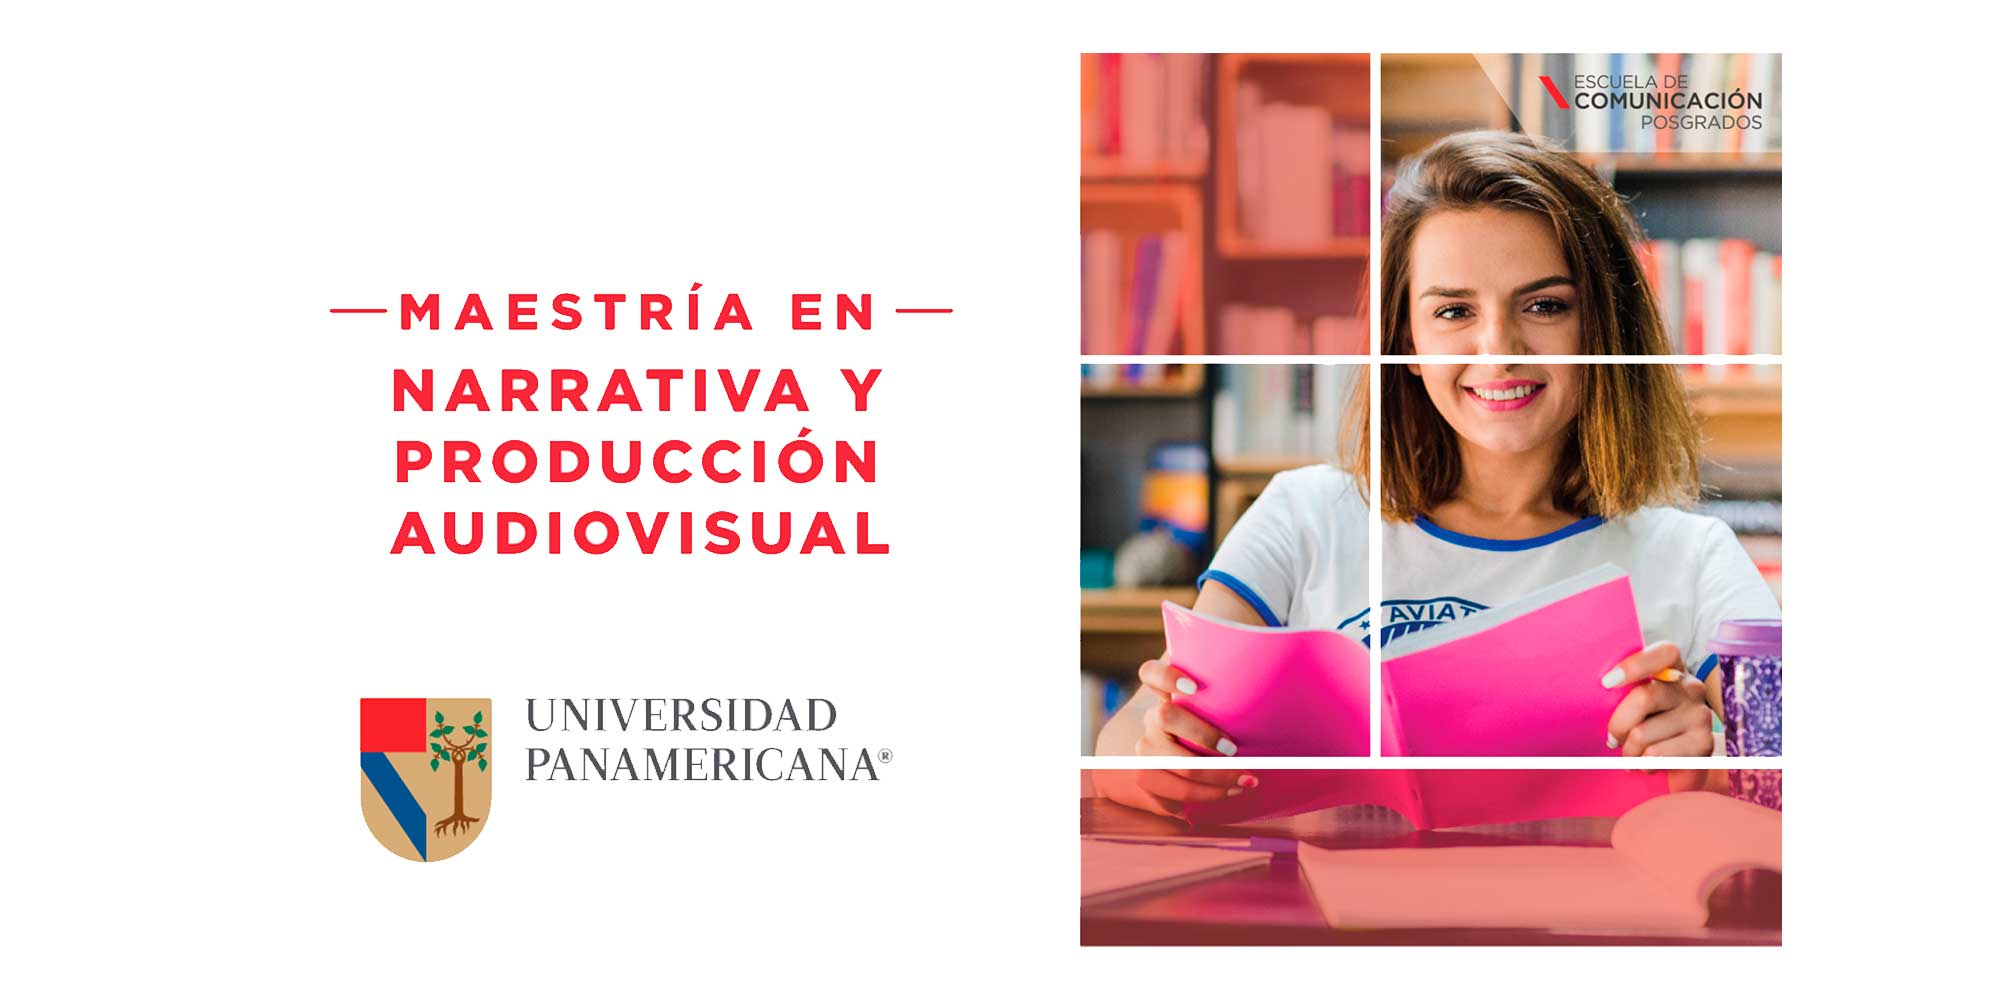 Evento-UniversidadPanamericana